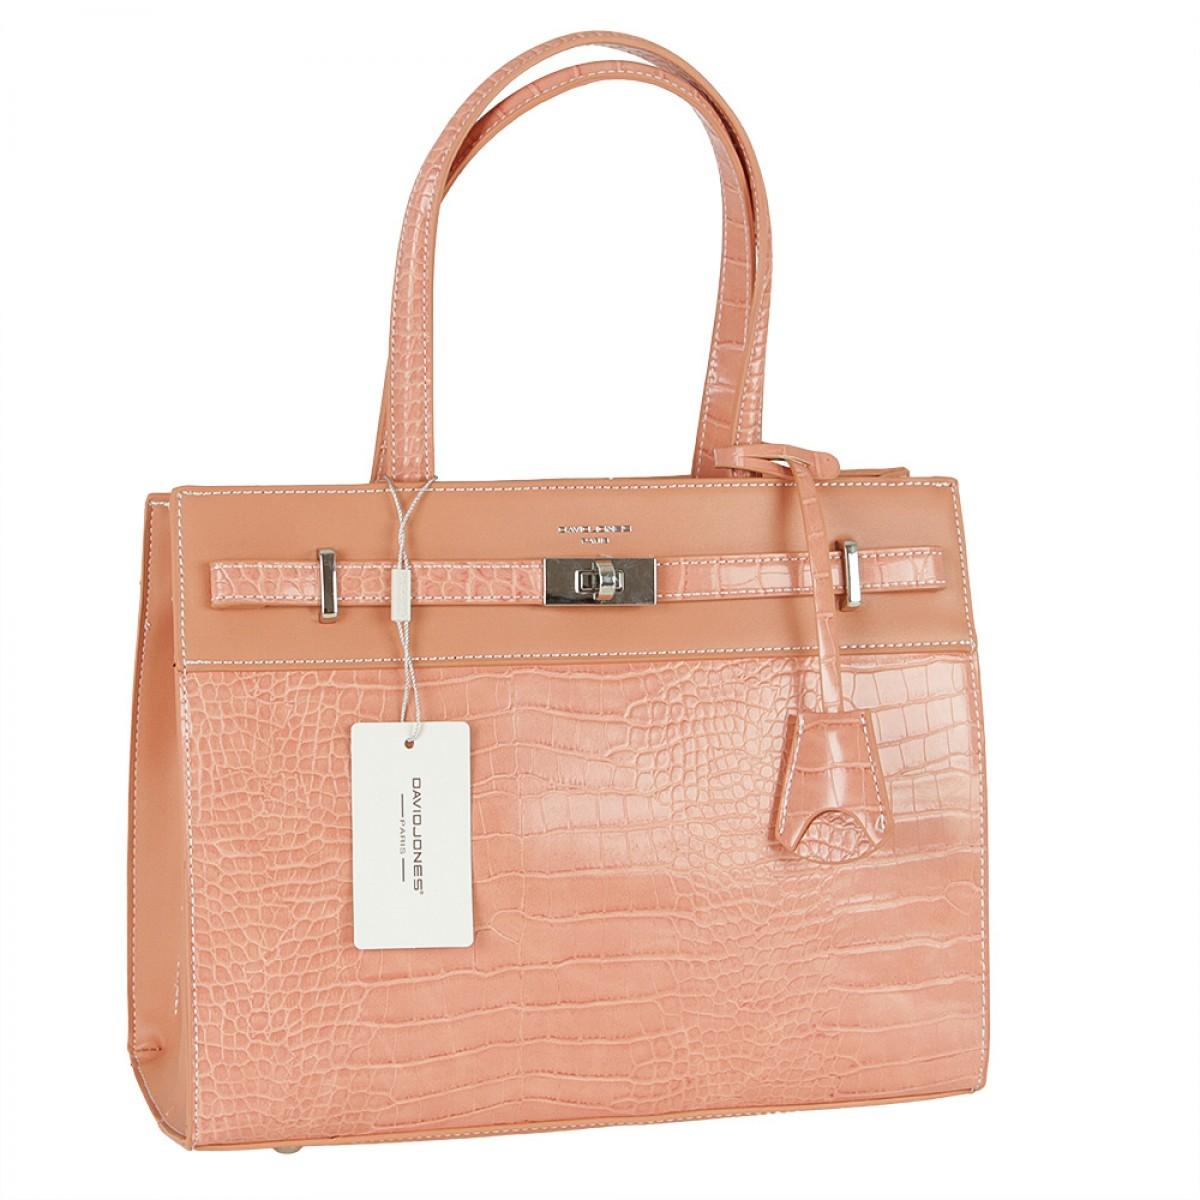 Жіноча сумка David Jones CM5634 CORAL